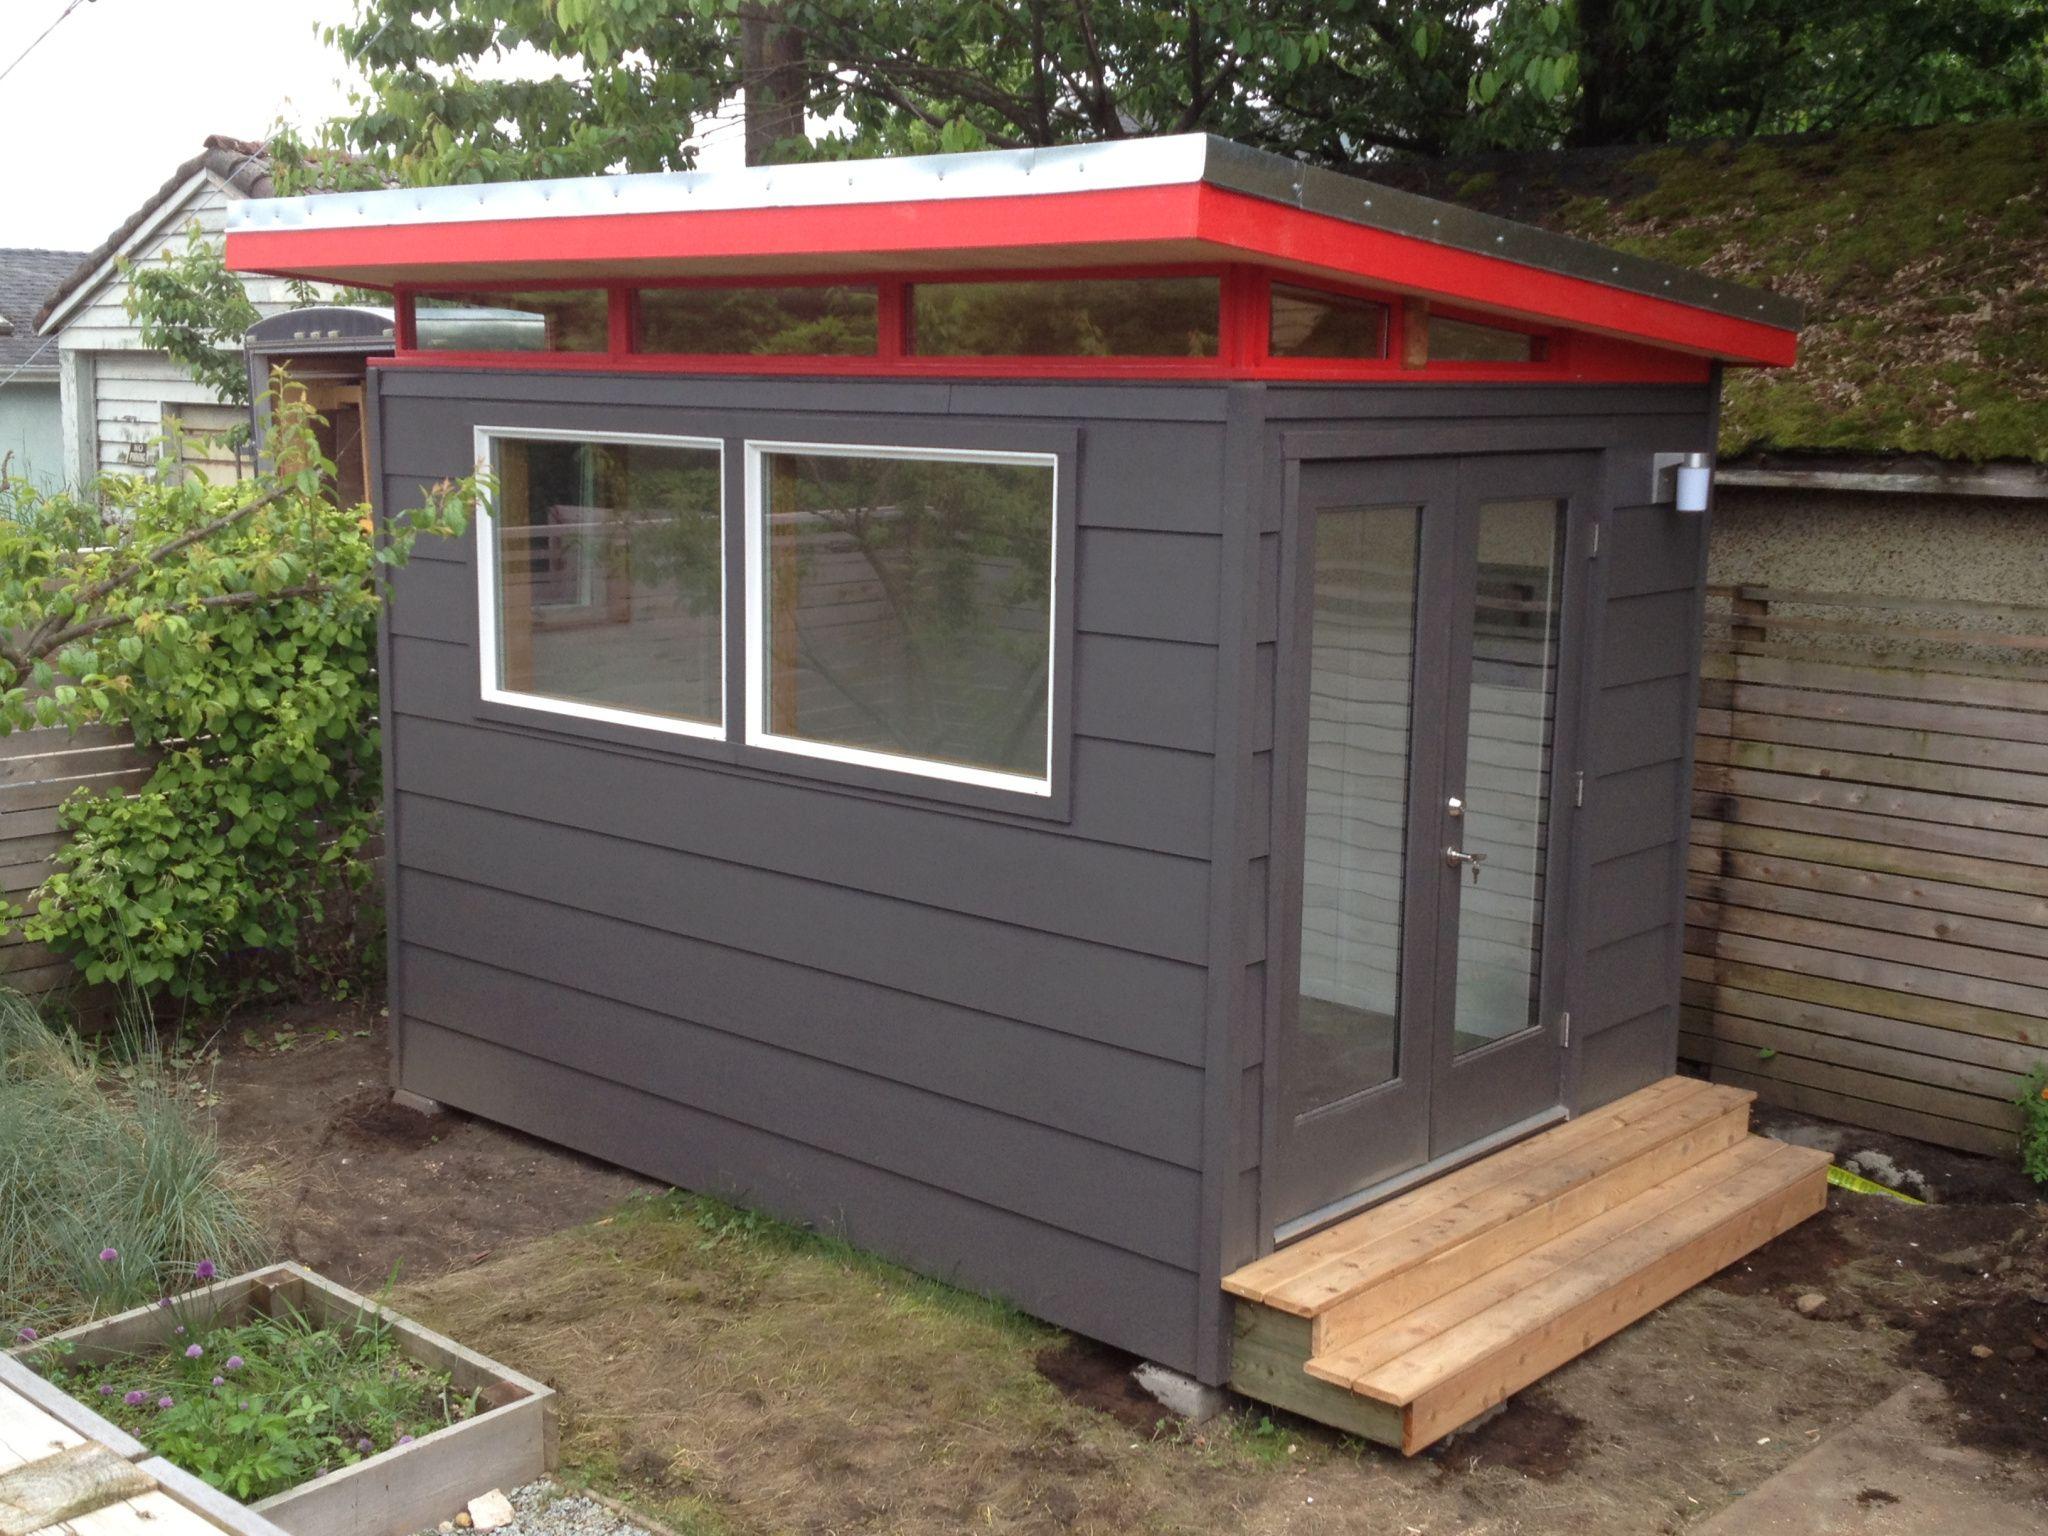 Kwik built kit homes clipart graphic freeuse 8x12 Backyard Music Studio - Prefab Music Studio Kit   Office shed ... graphic freeuse